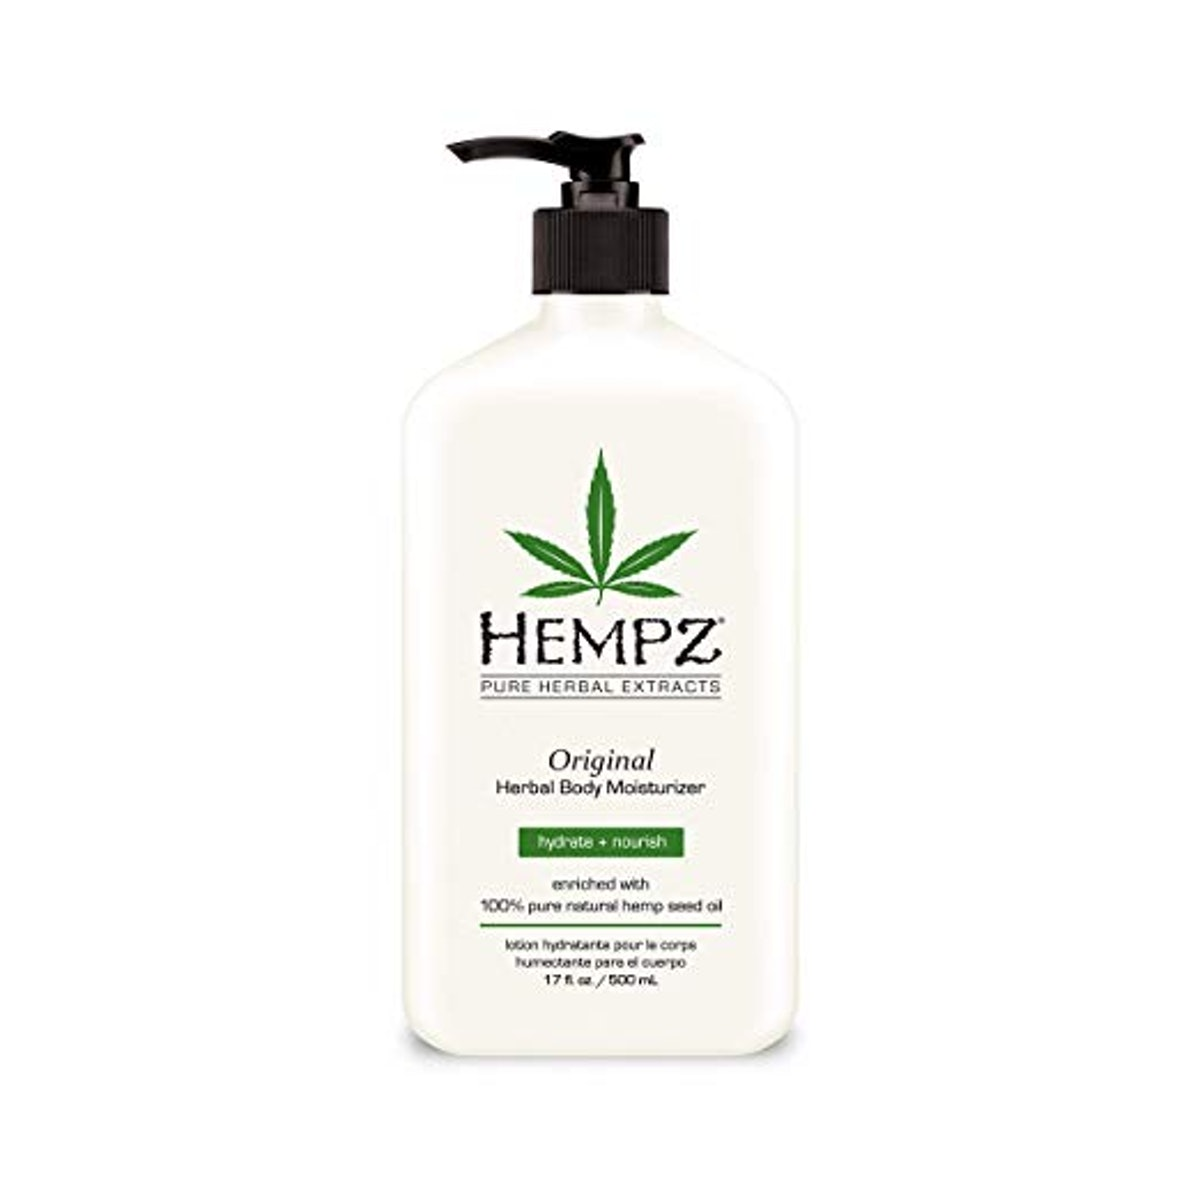 Natural Hemp Seed Oil Body Moisturizer